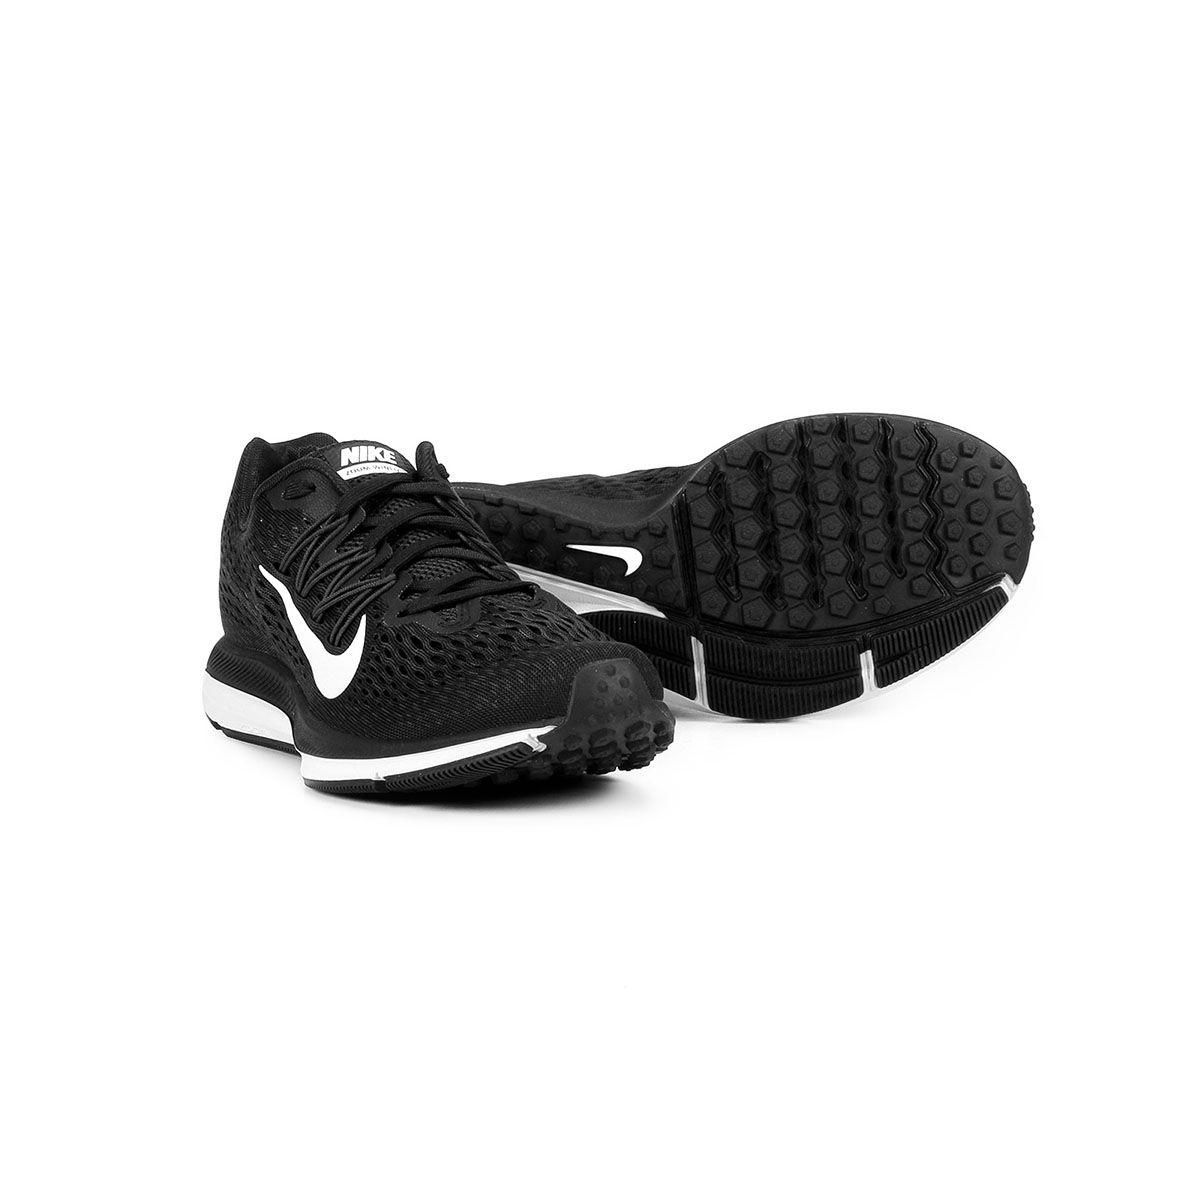 0c92012126c Tênis Nike Zoom Winflo 5 Feminino